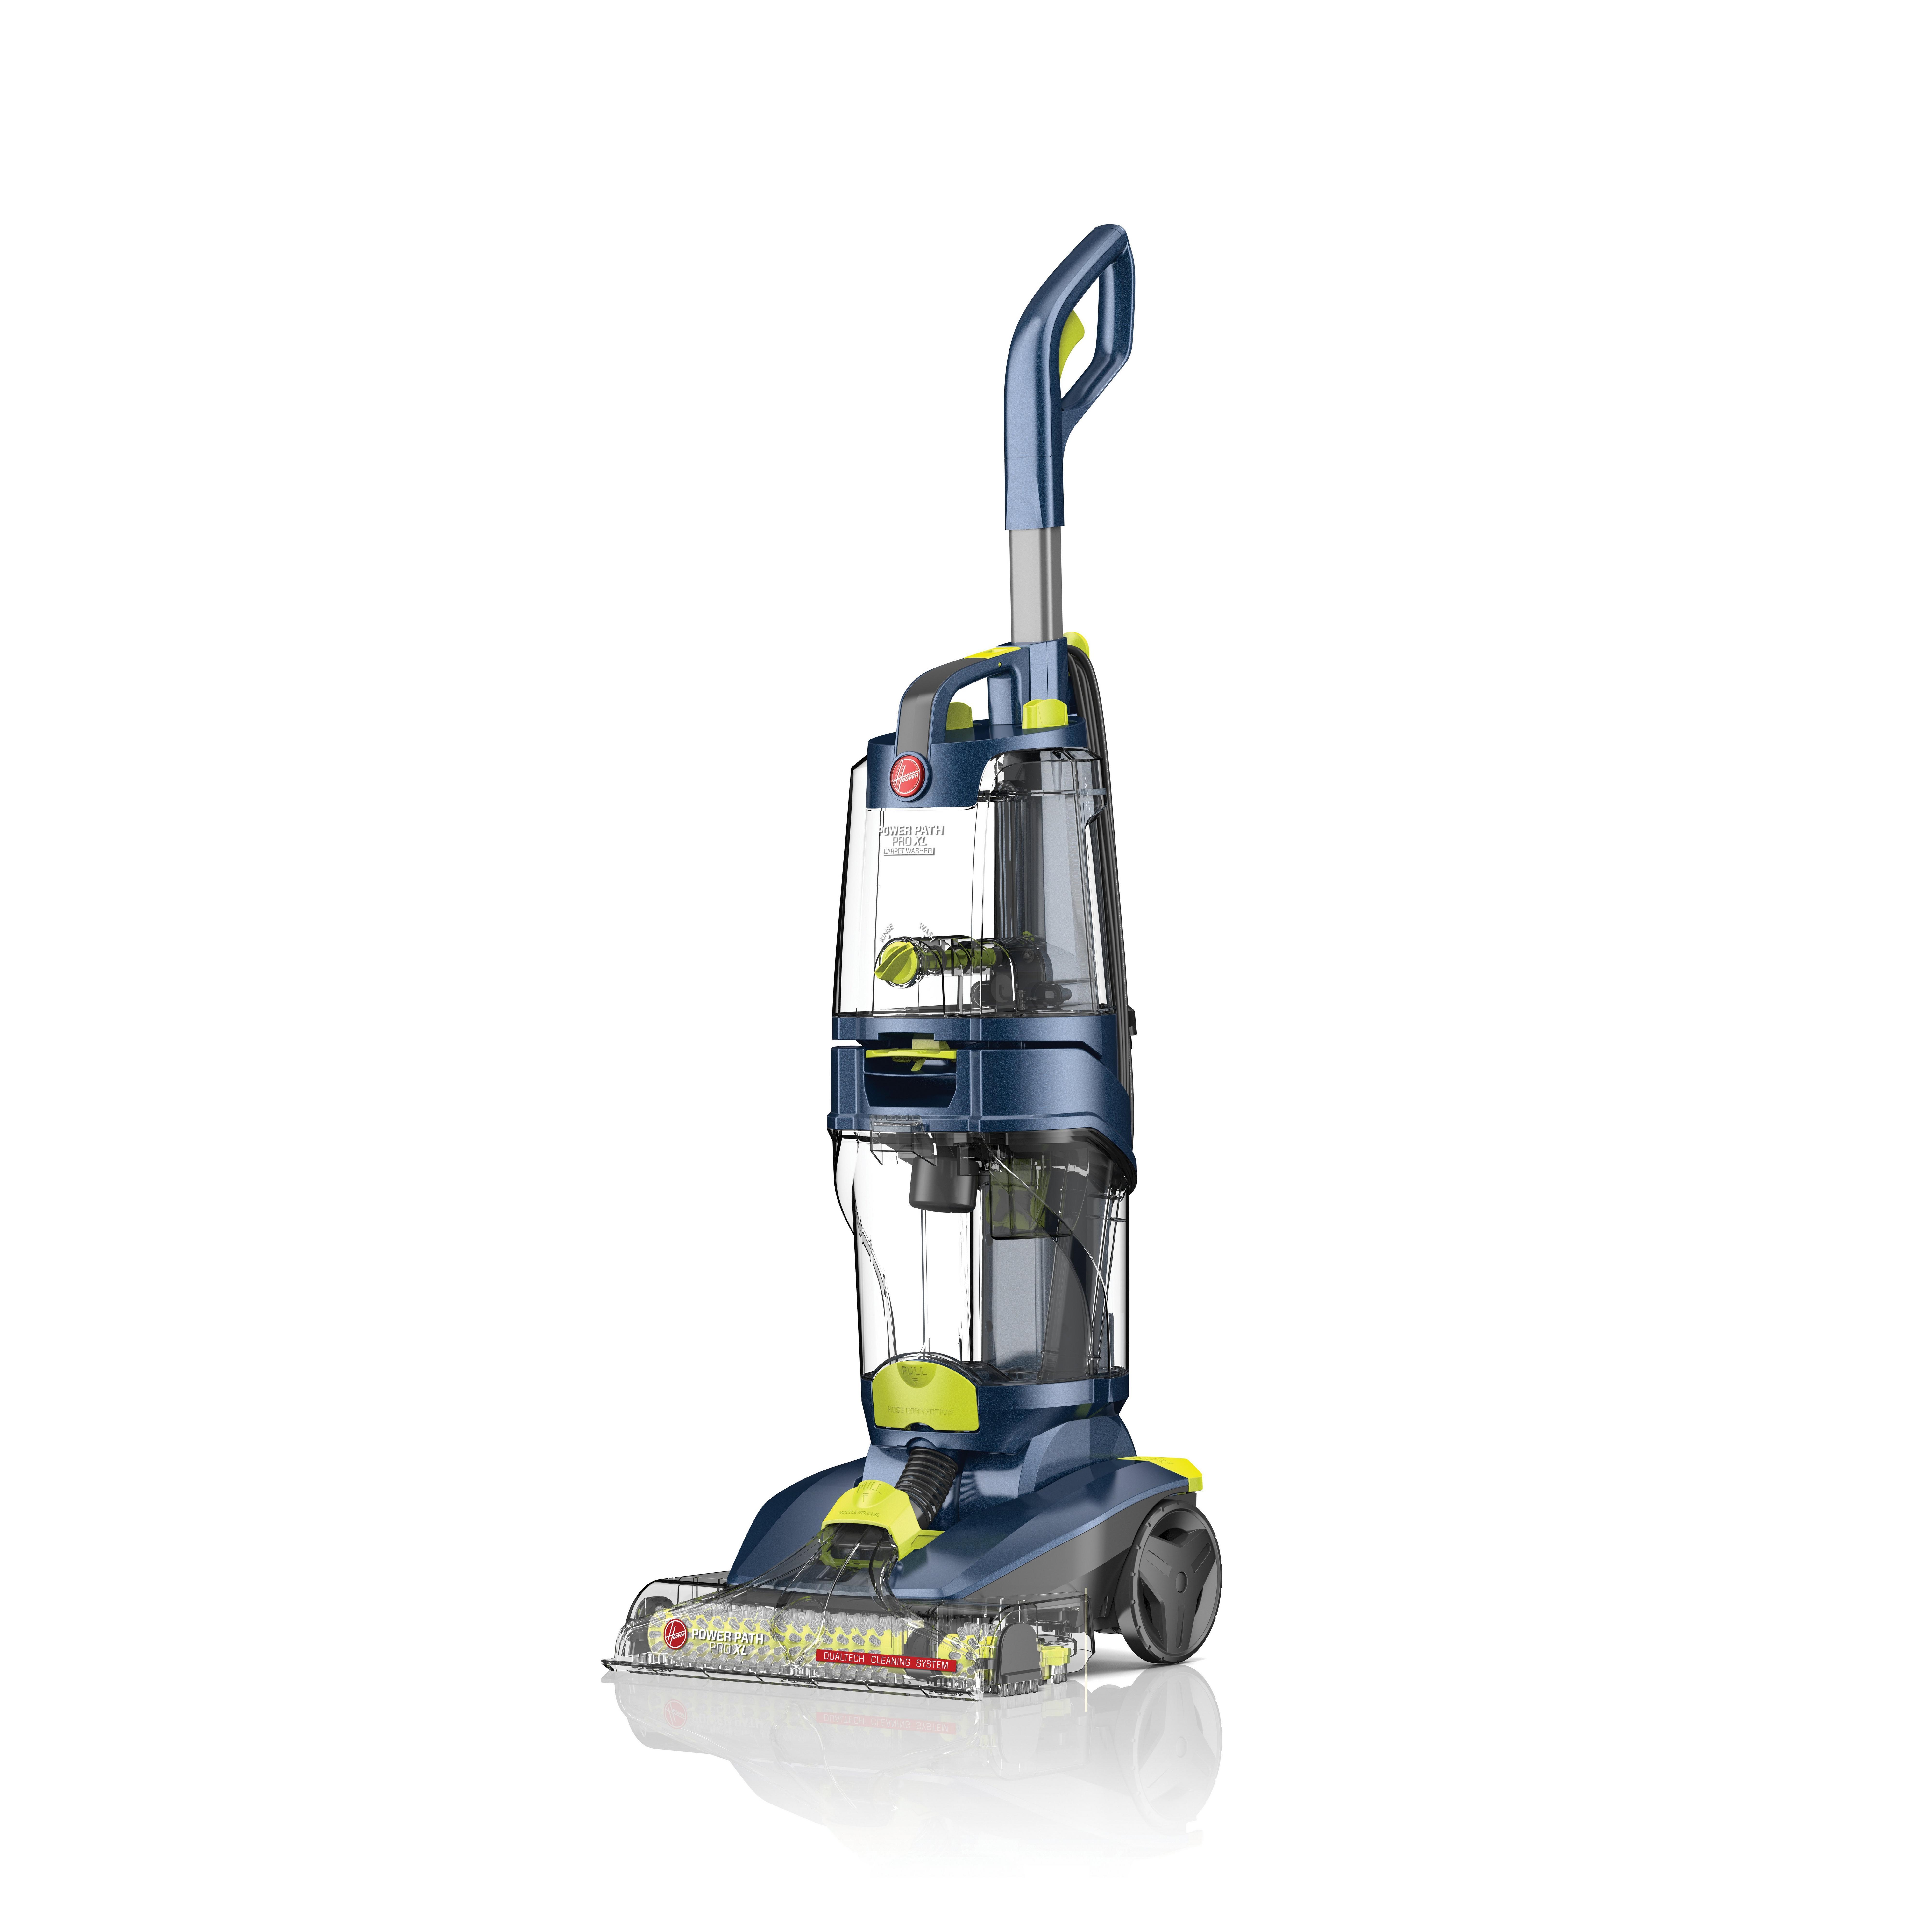 Power Path Pro XL Carpet Cleaner2